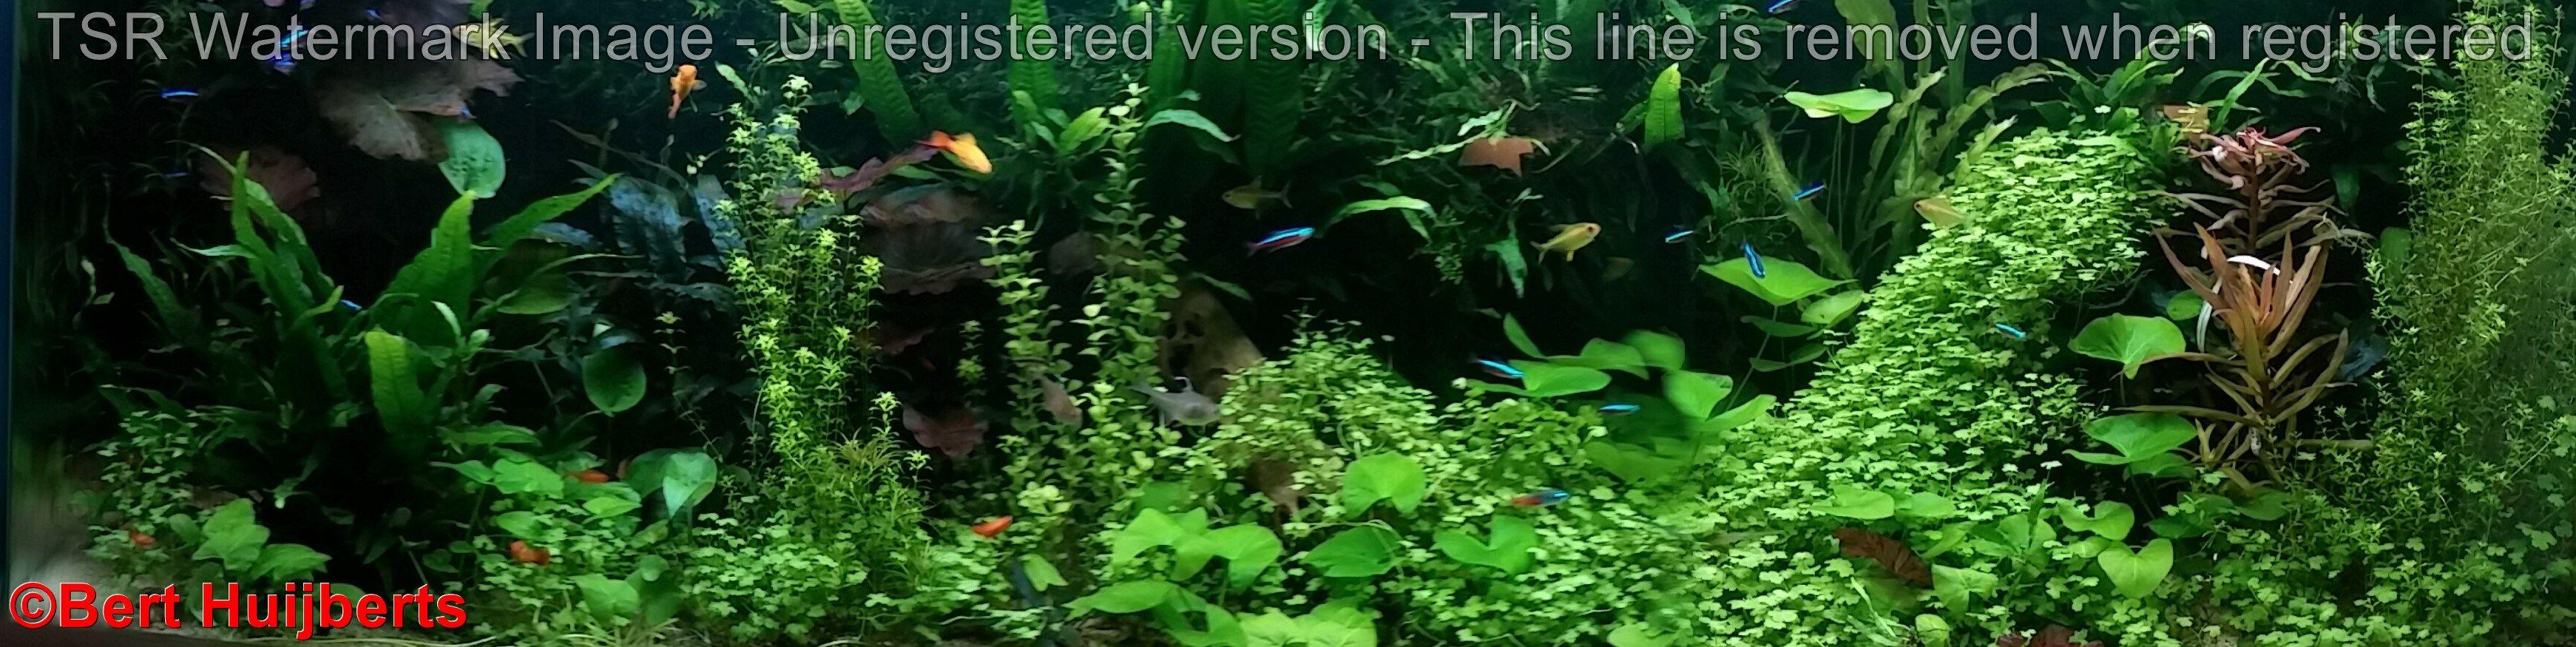 Pin by bert huijberts on aquarium pinterest aquariums